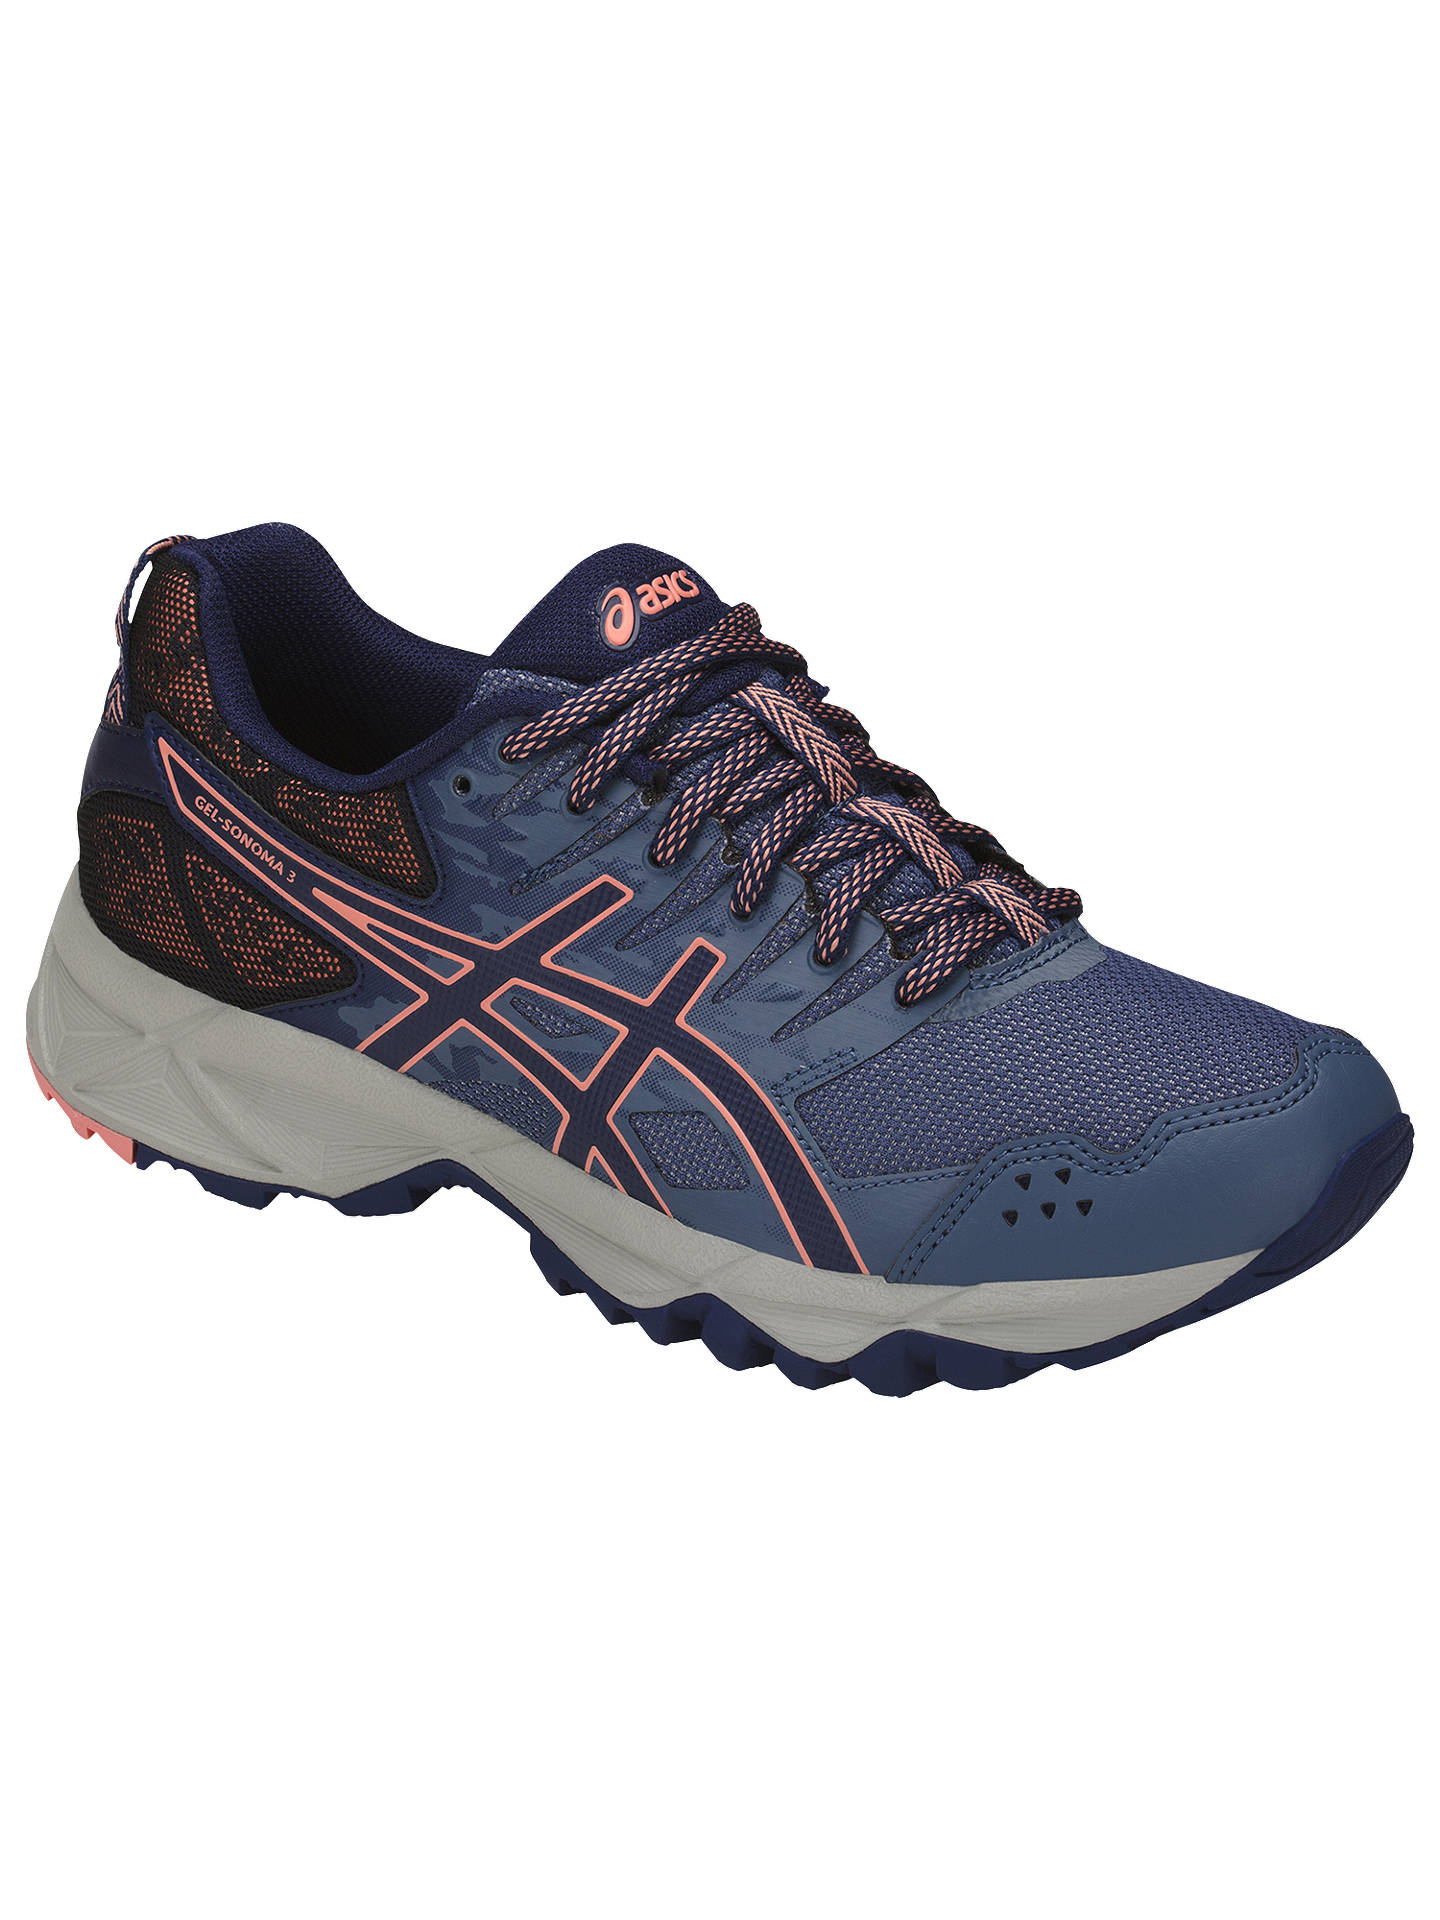 e98ba53a ... Buy Asics GEL-SONOMA 3 Women's Trail Running Shoes, Smoke Blue, 4  Online ...